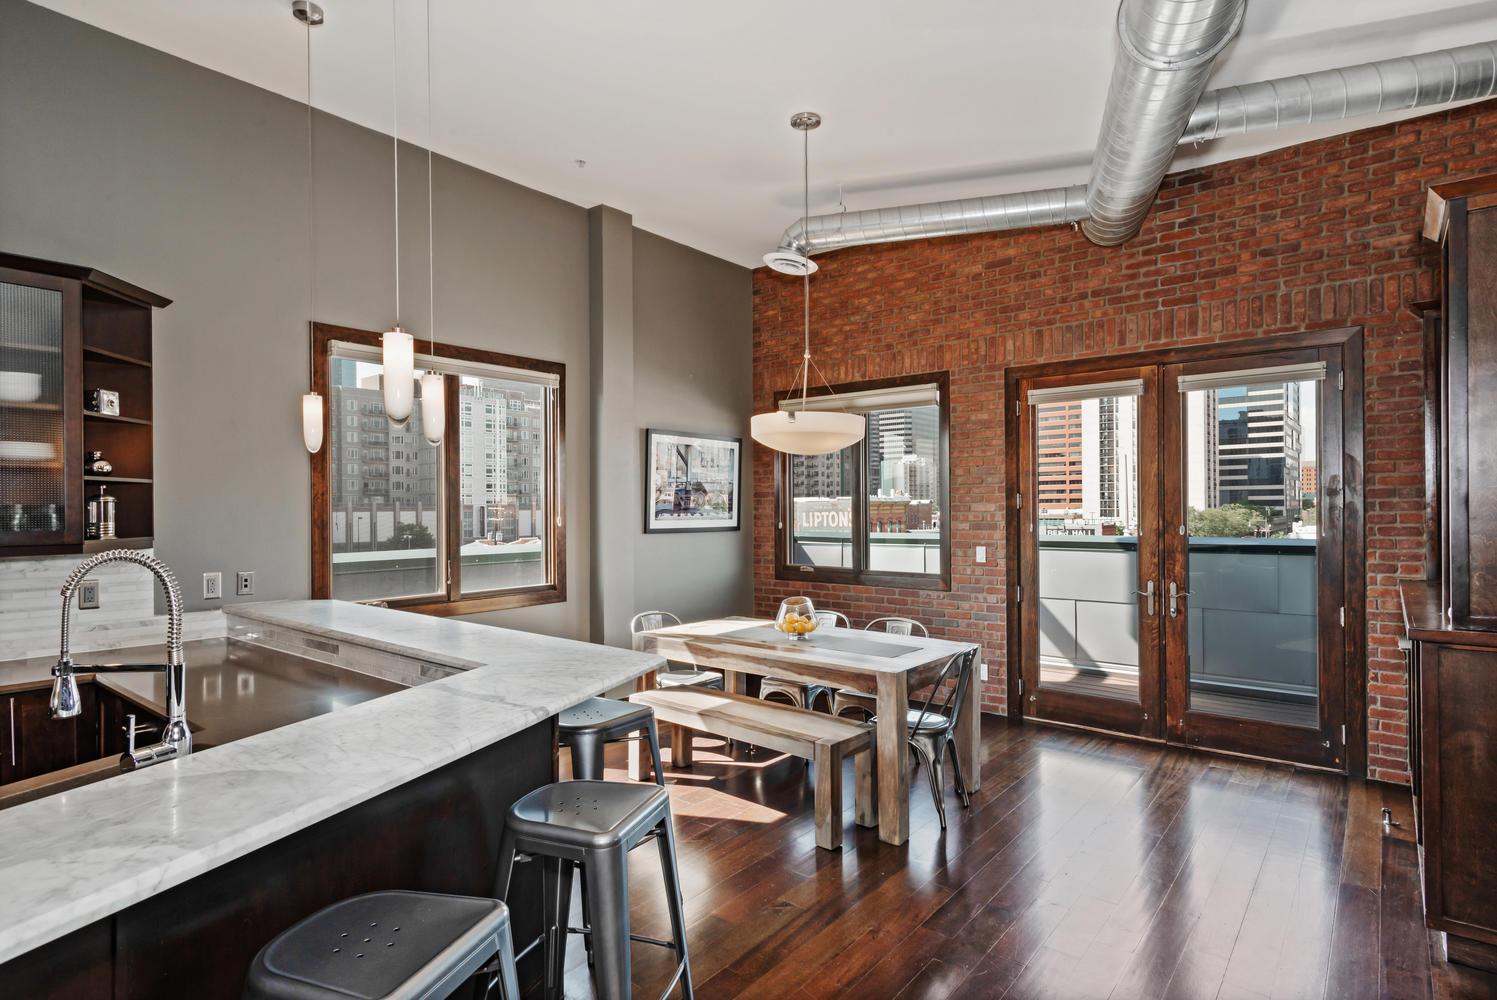 2101 Larimer St Unit 401-large-002-17-Kitchen Dining Room-1497×1000-72dpi